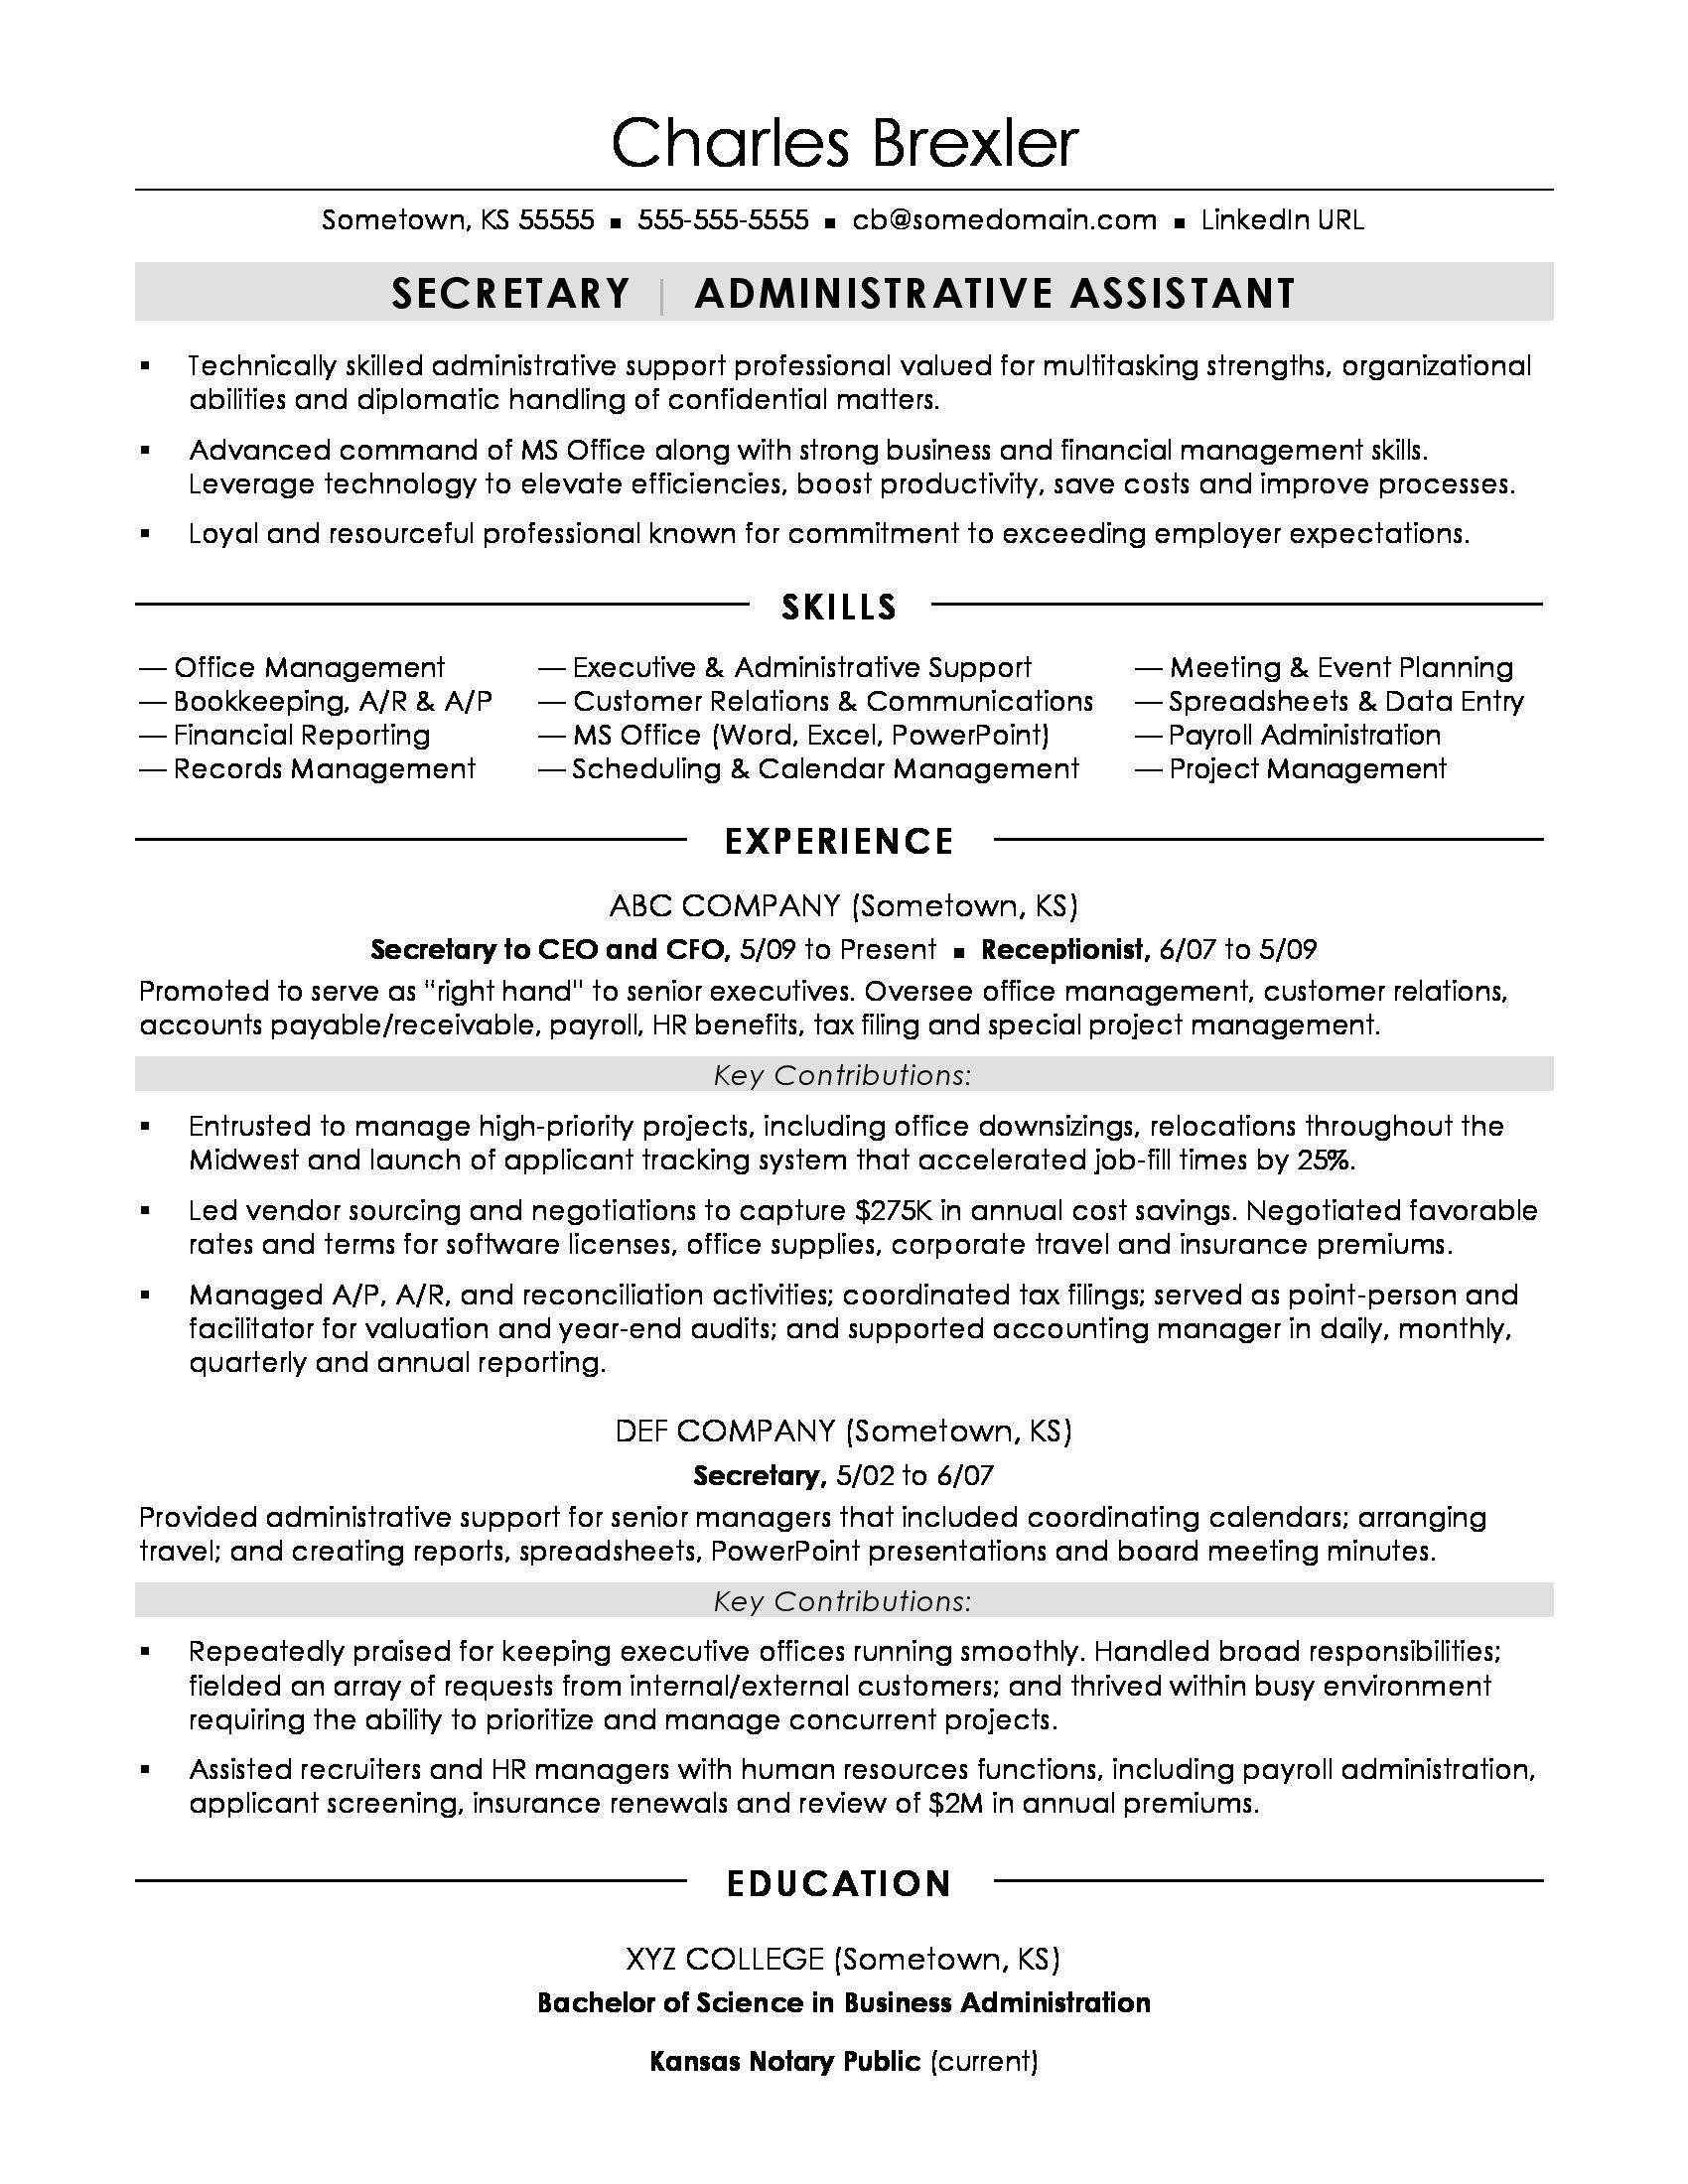 Sample Resume for Secretary Of the Company Secretary Resume Sample Monster.com